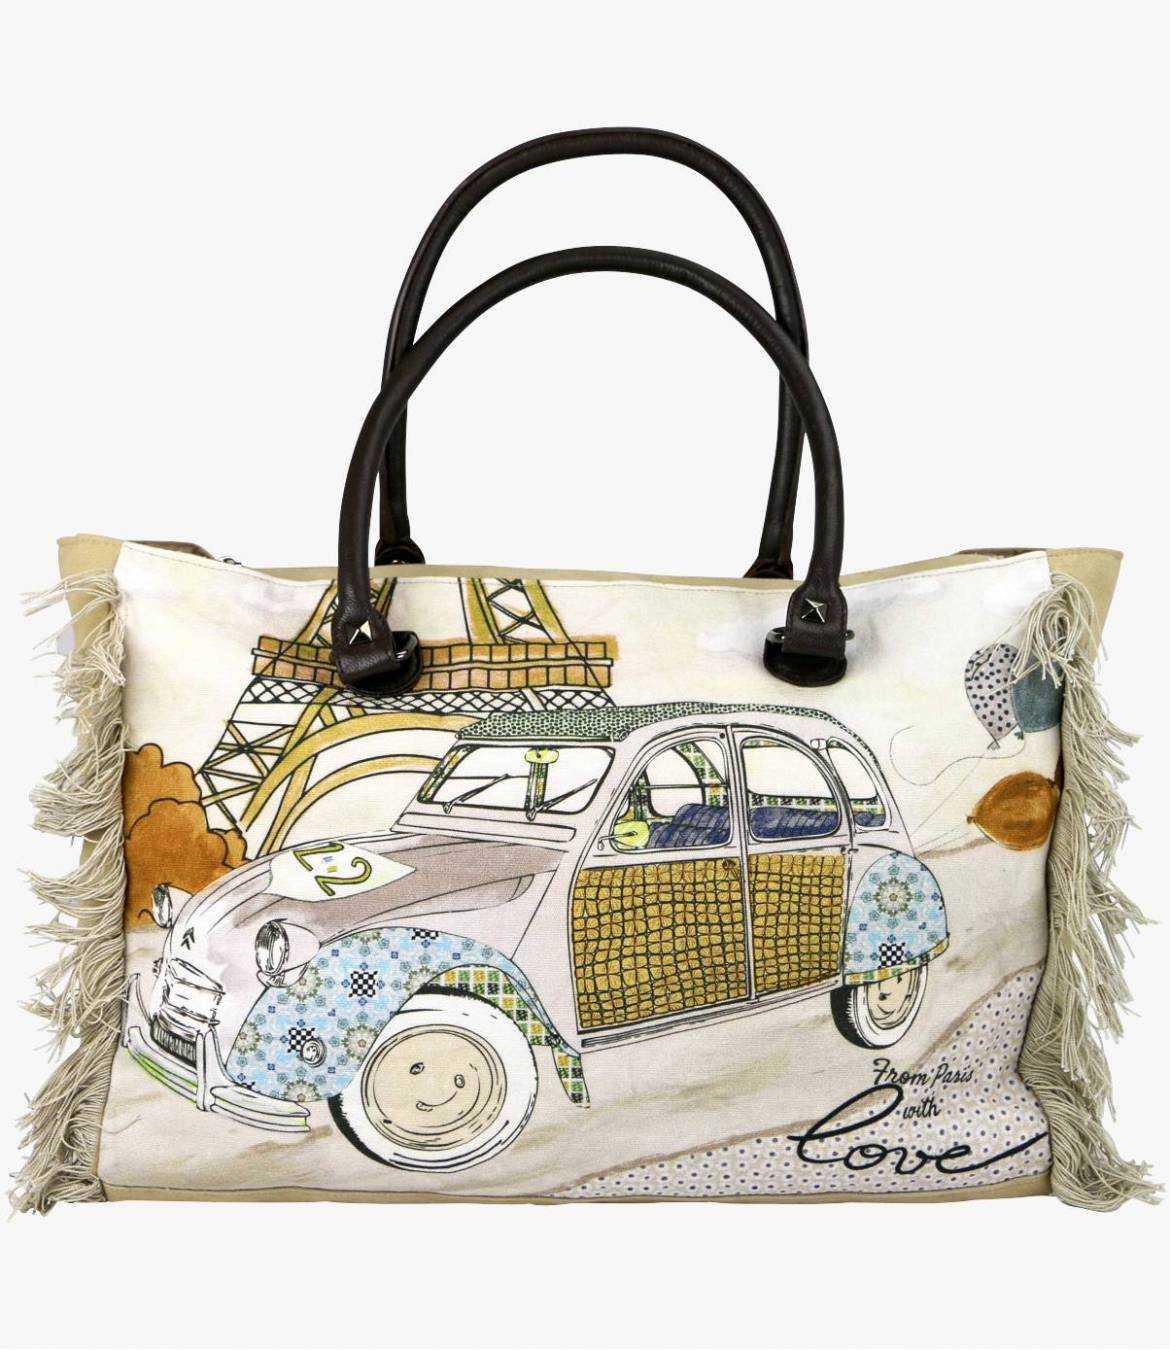 CRUISE - GAMME VOYAGE Women's Cotton Bag 40x30x15 cm Storiatipic - 4